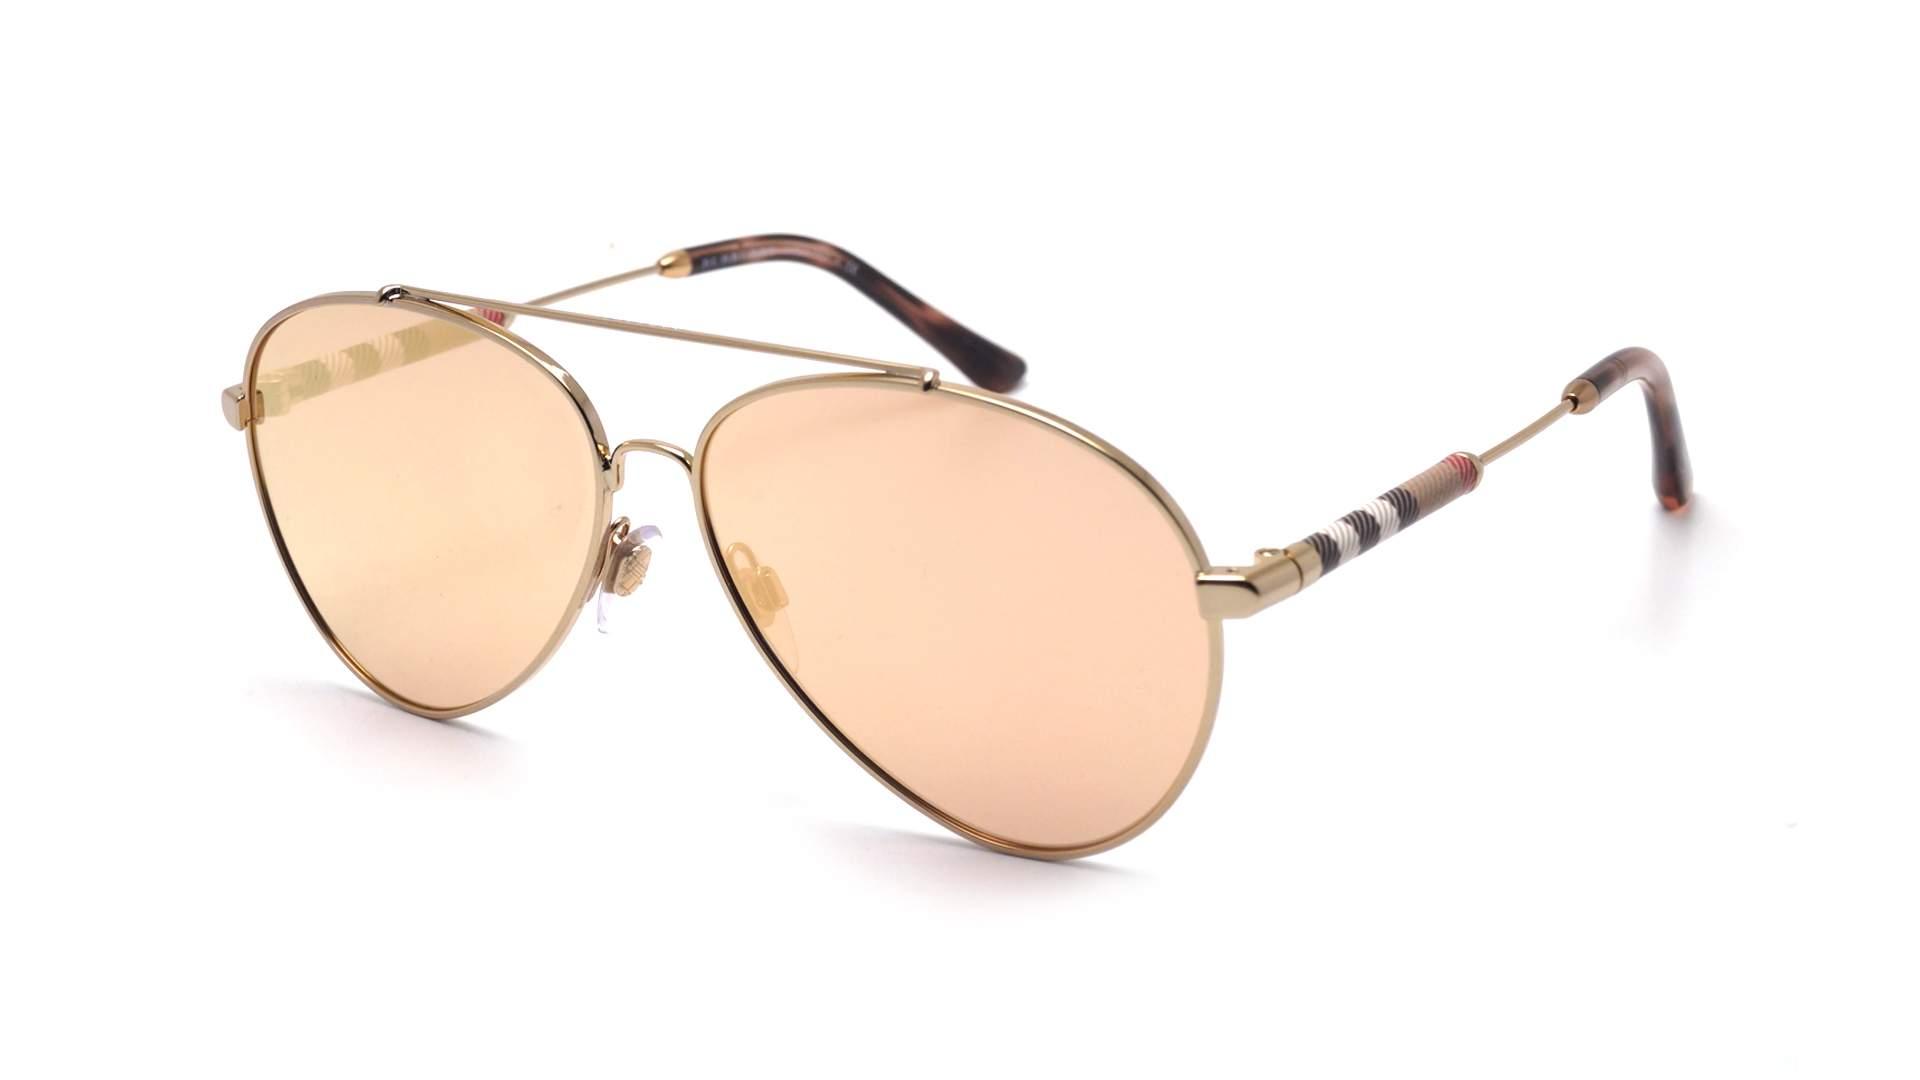 8cc3f0158ef2 Sunglasses Burberry BE3092Q 12437J 57-13 Gold Large Mirror